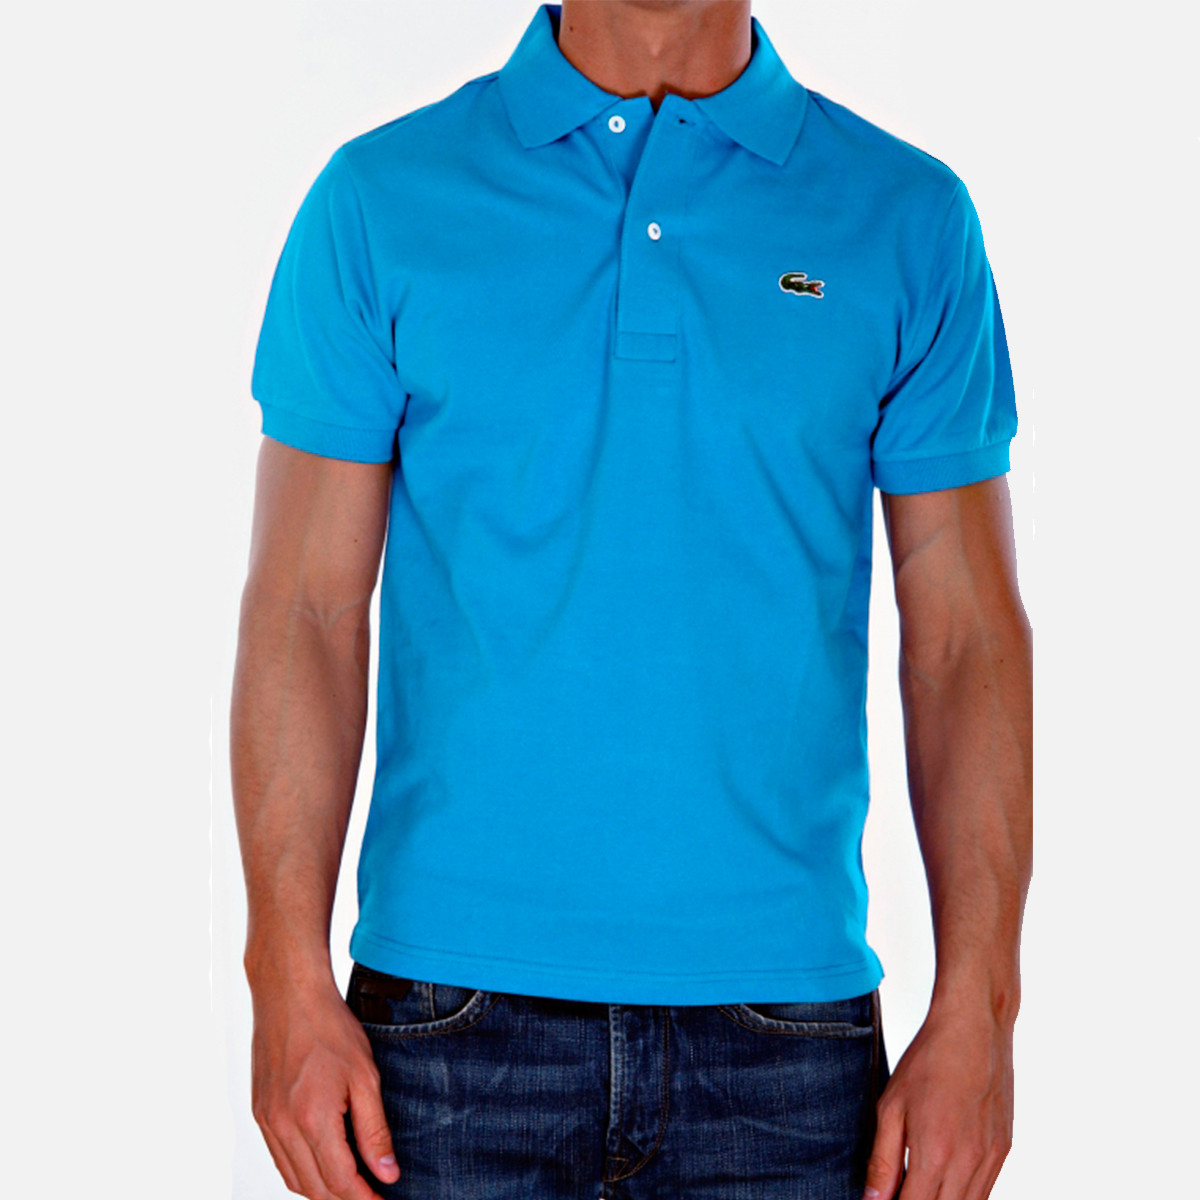 fa1b0a50fddf Мужская футболка поло Lacoste голубая